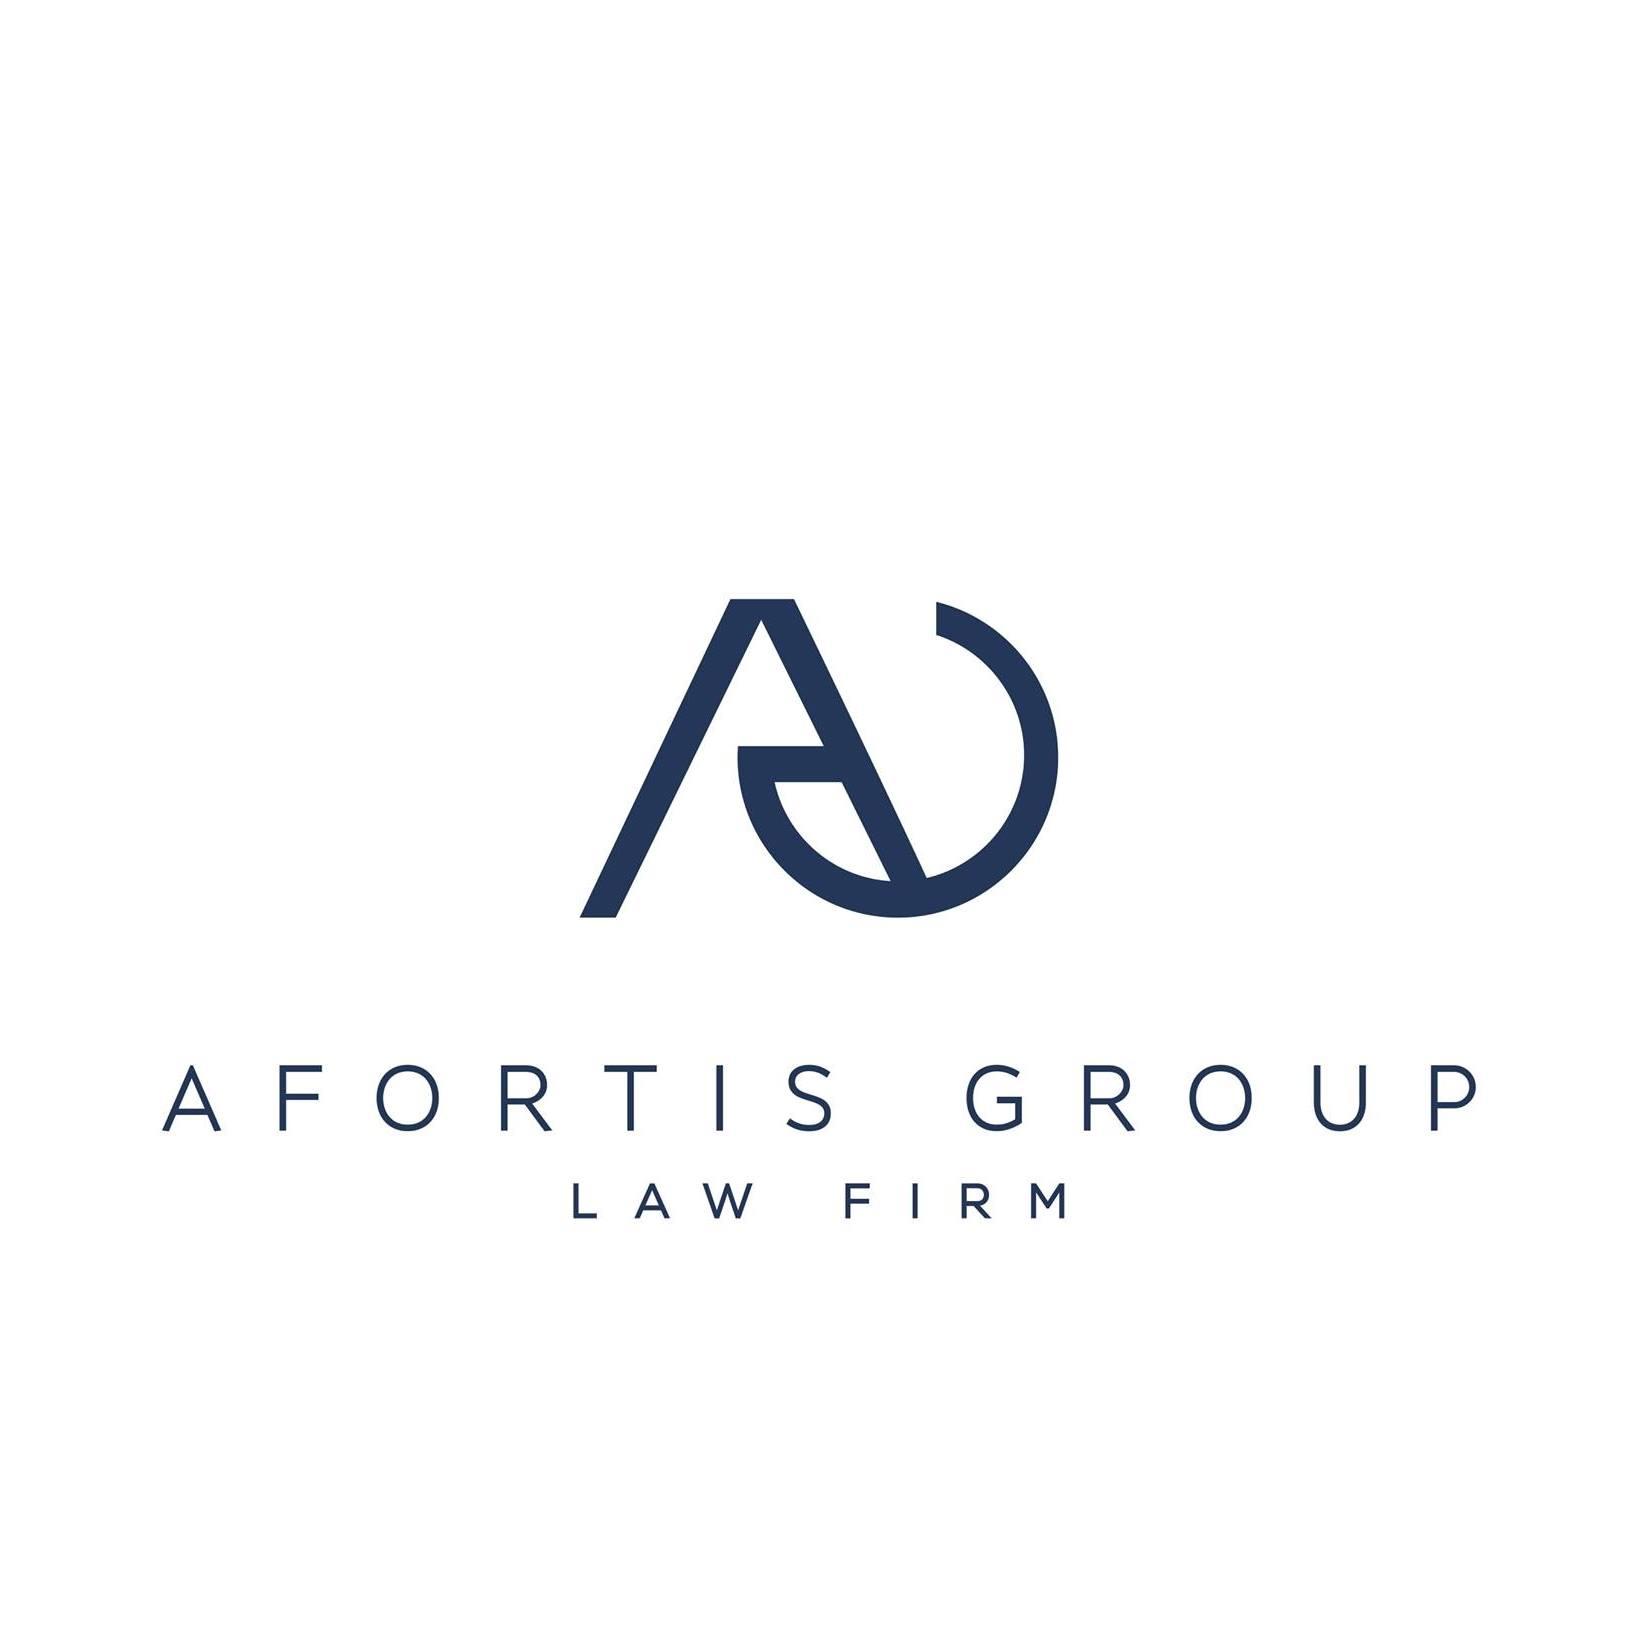 AFORTIS Group, SIA